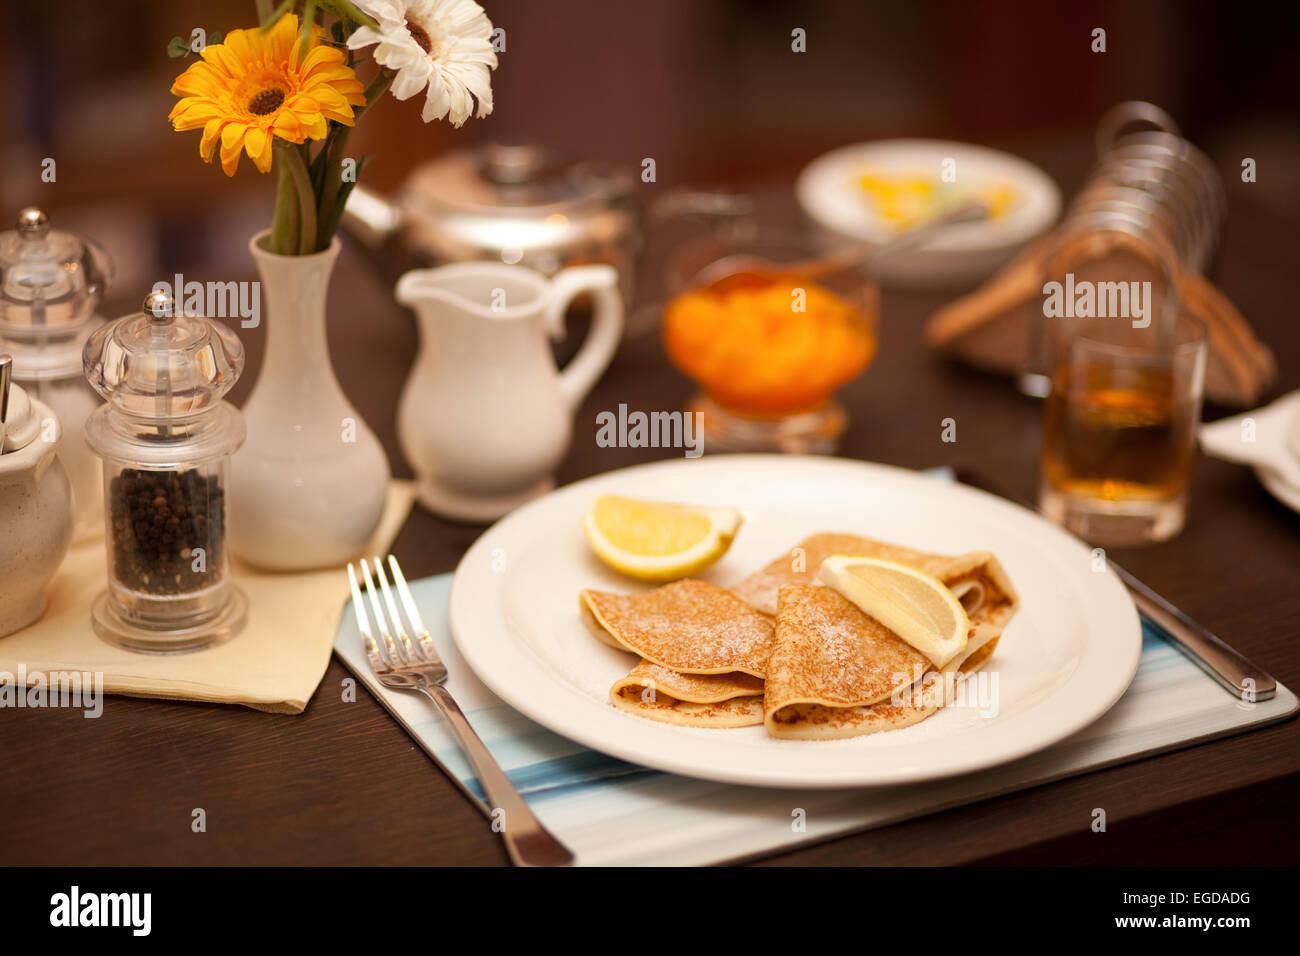 A pancake breakfast - Stock Image